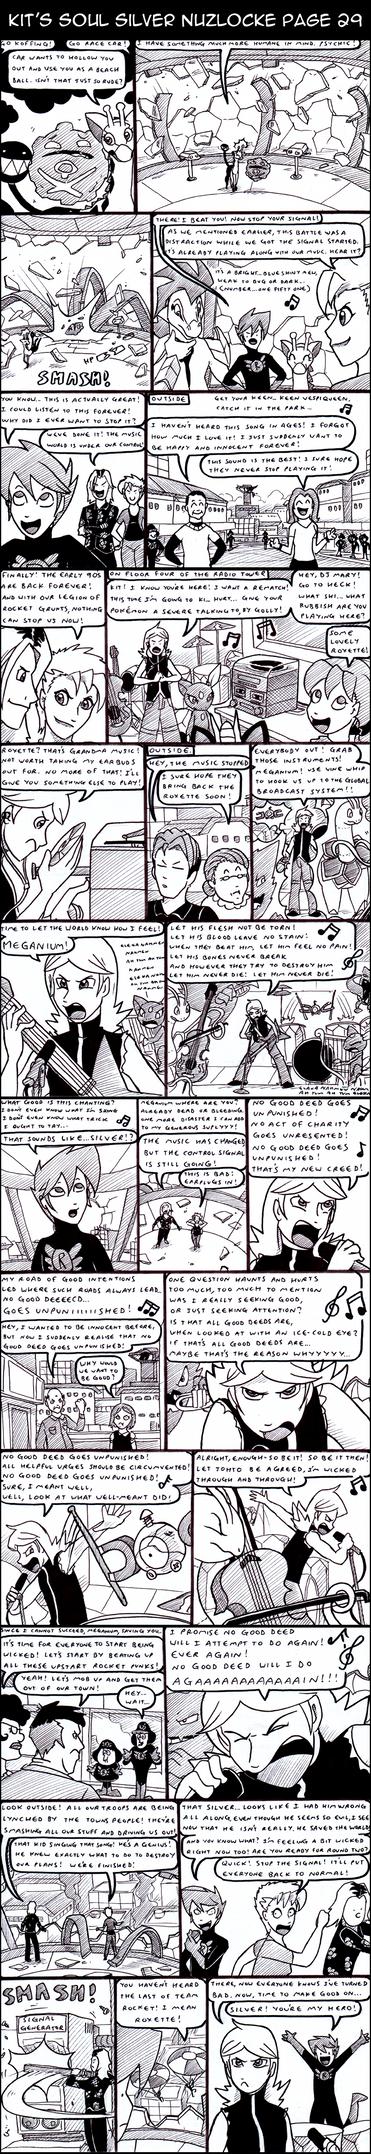 Kit's Soul Silver Nuzlocke page 29 by kitfox-crimson